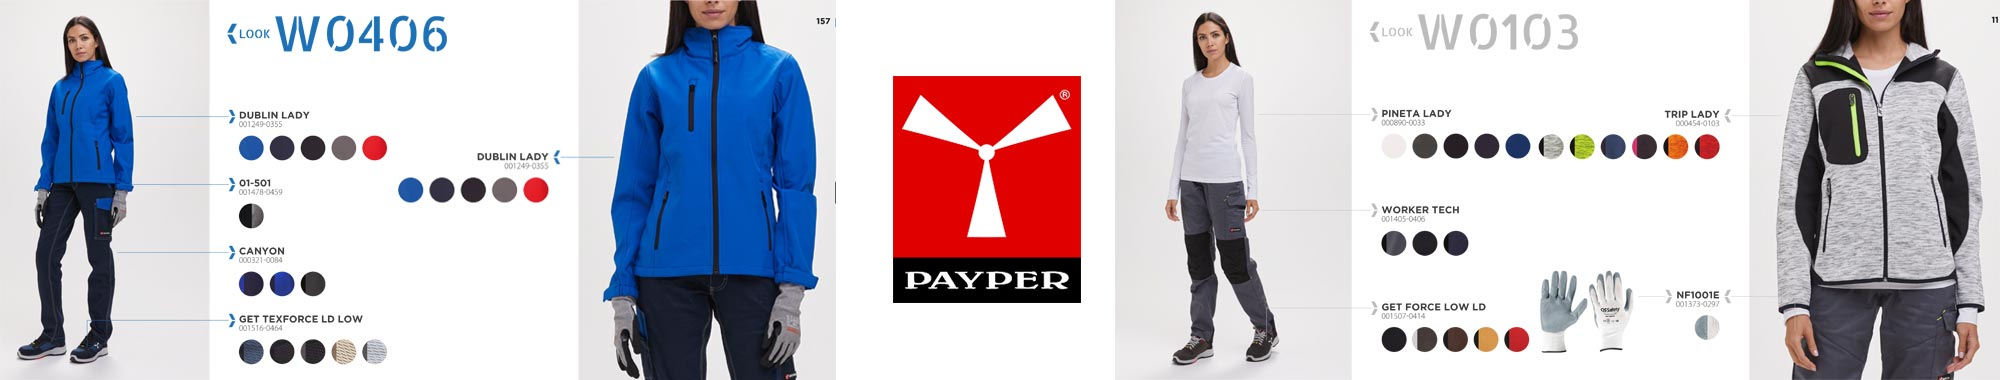 payper lady